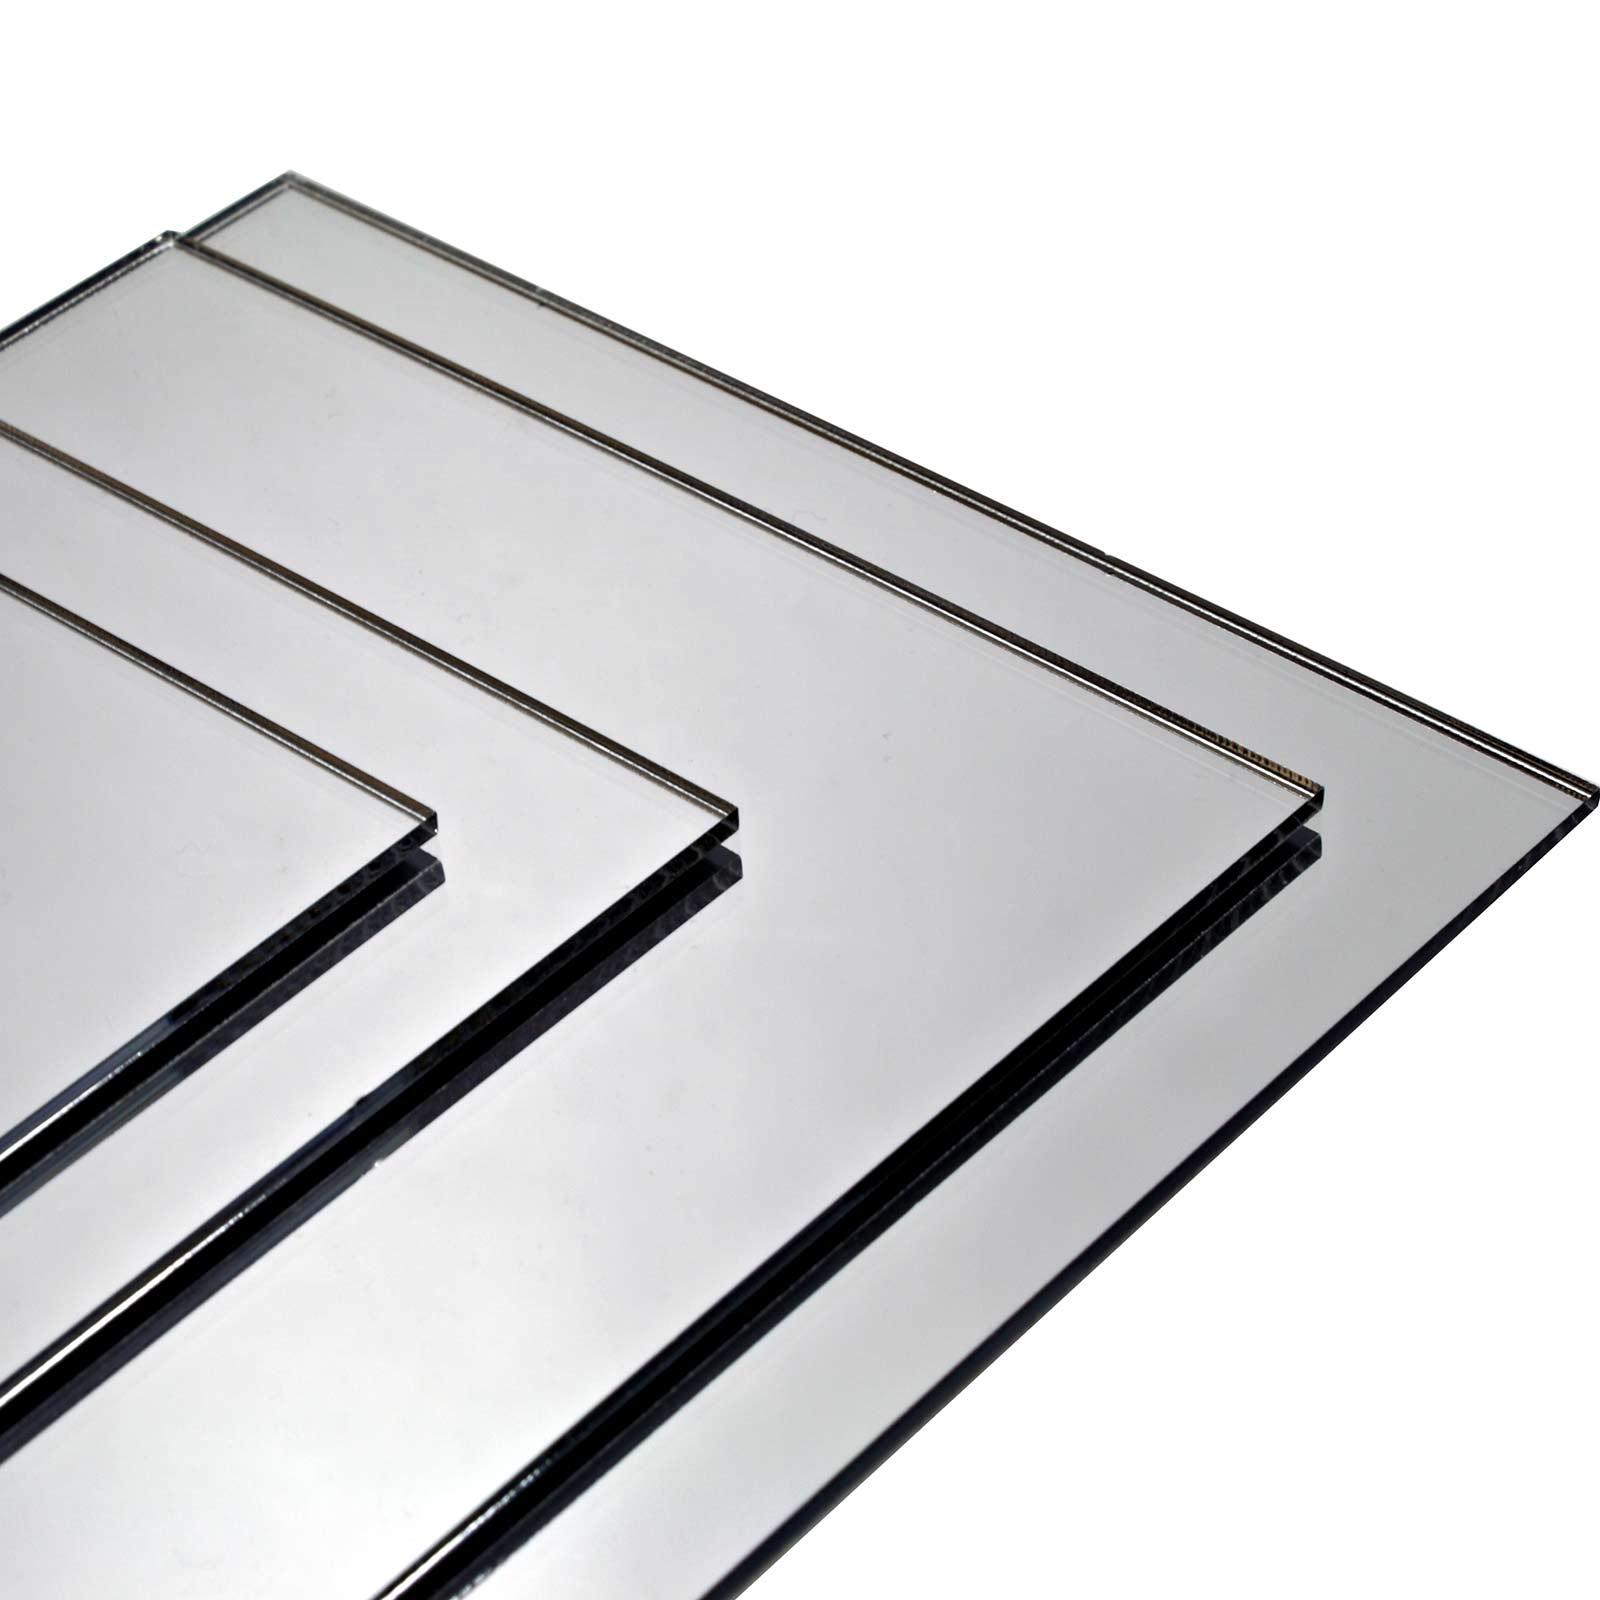 Mirrored Acrylic Sheet Cut to Size (DSA/3/+M)